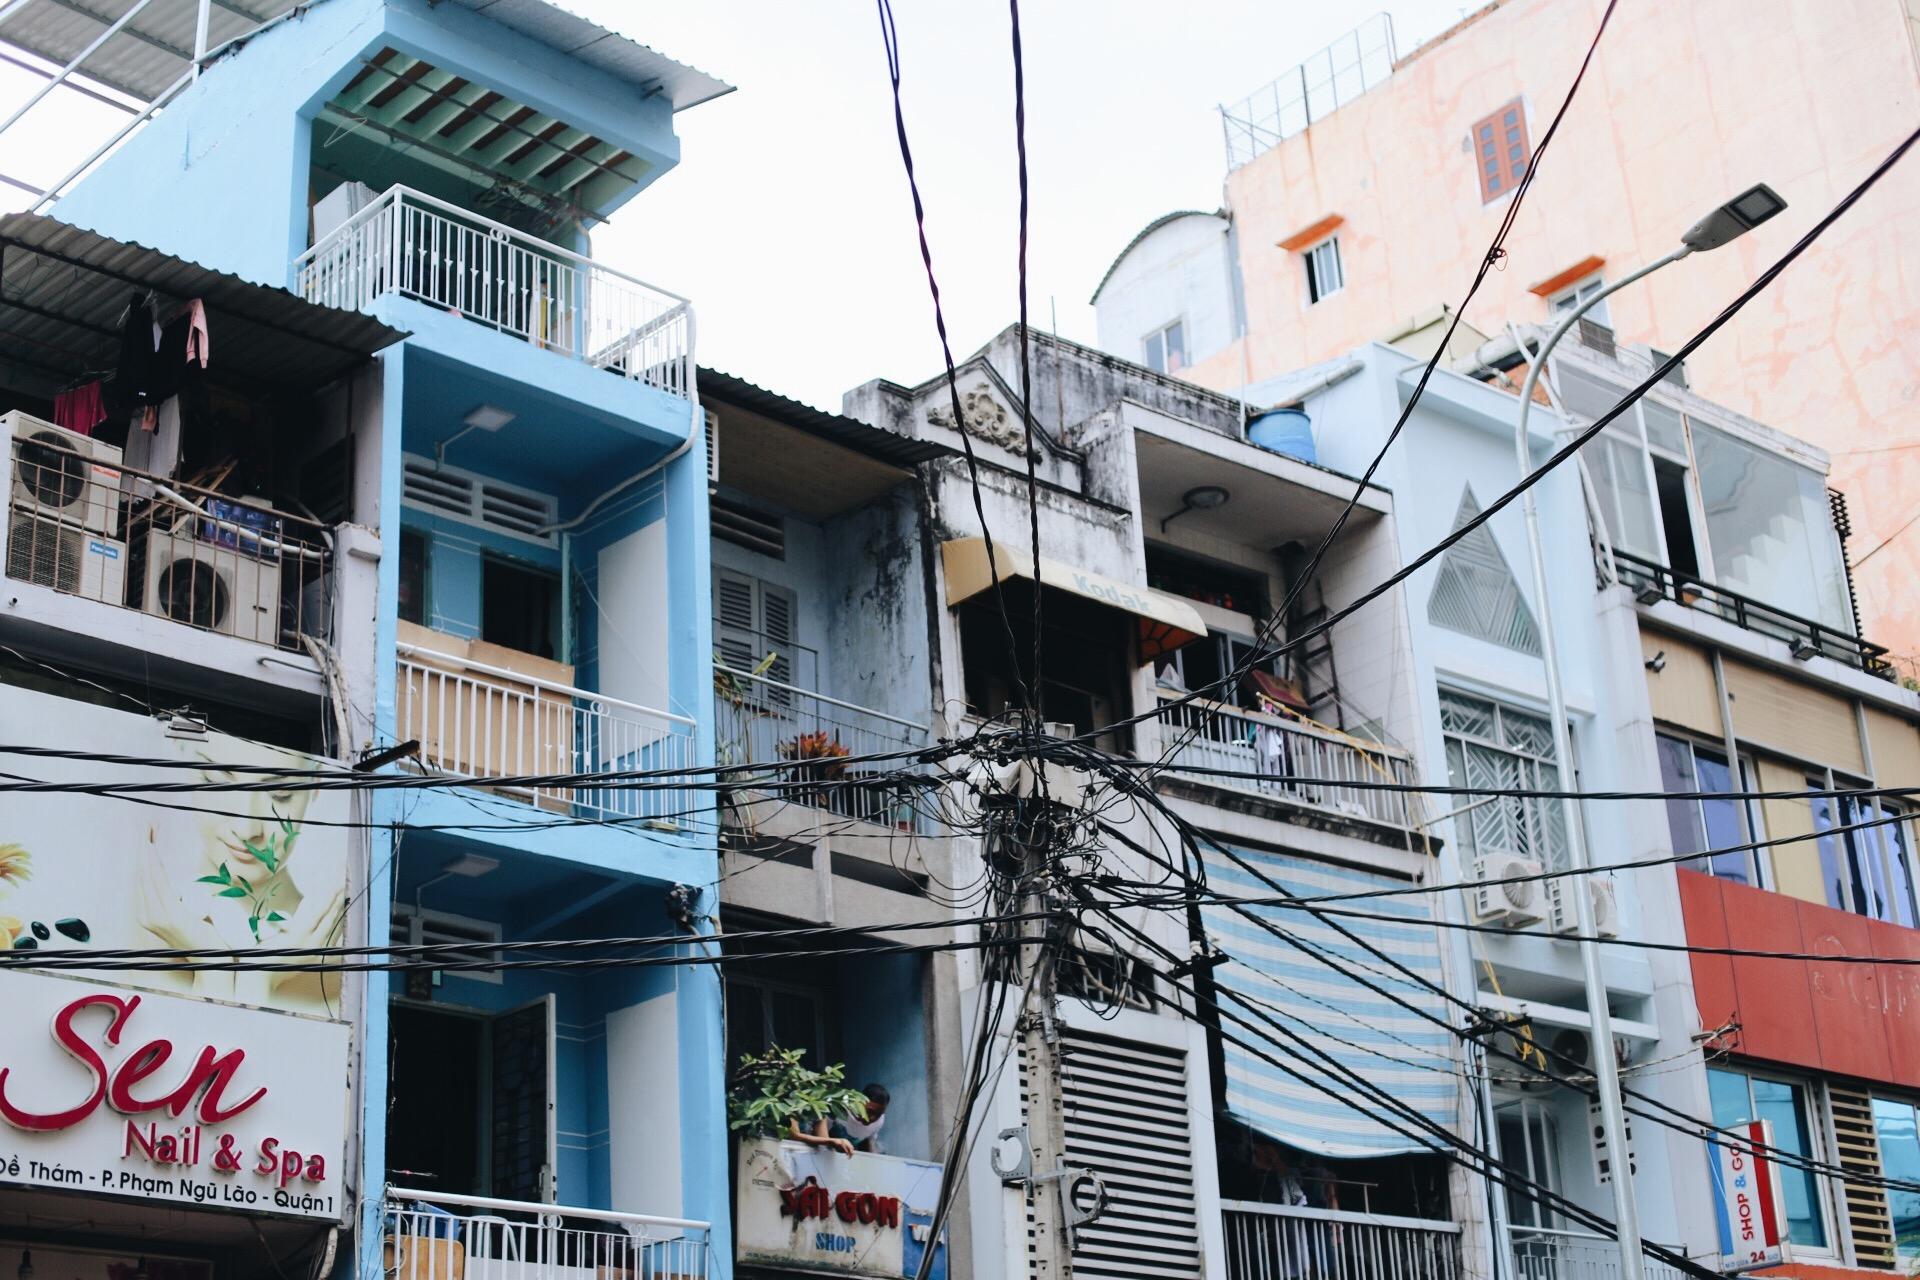 saigon-ho-cji-minh-ville-voyage-vietnam.JPG